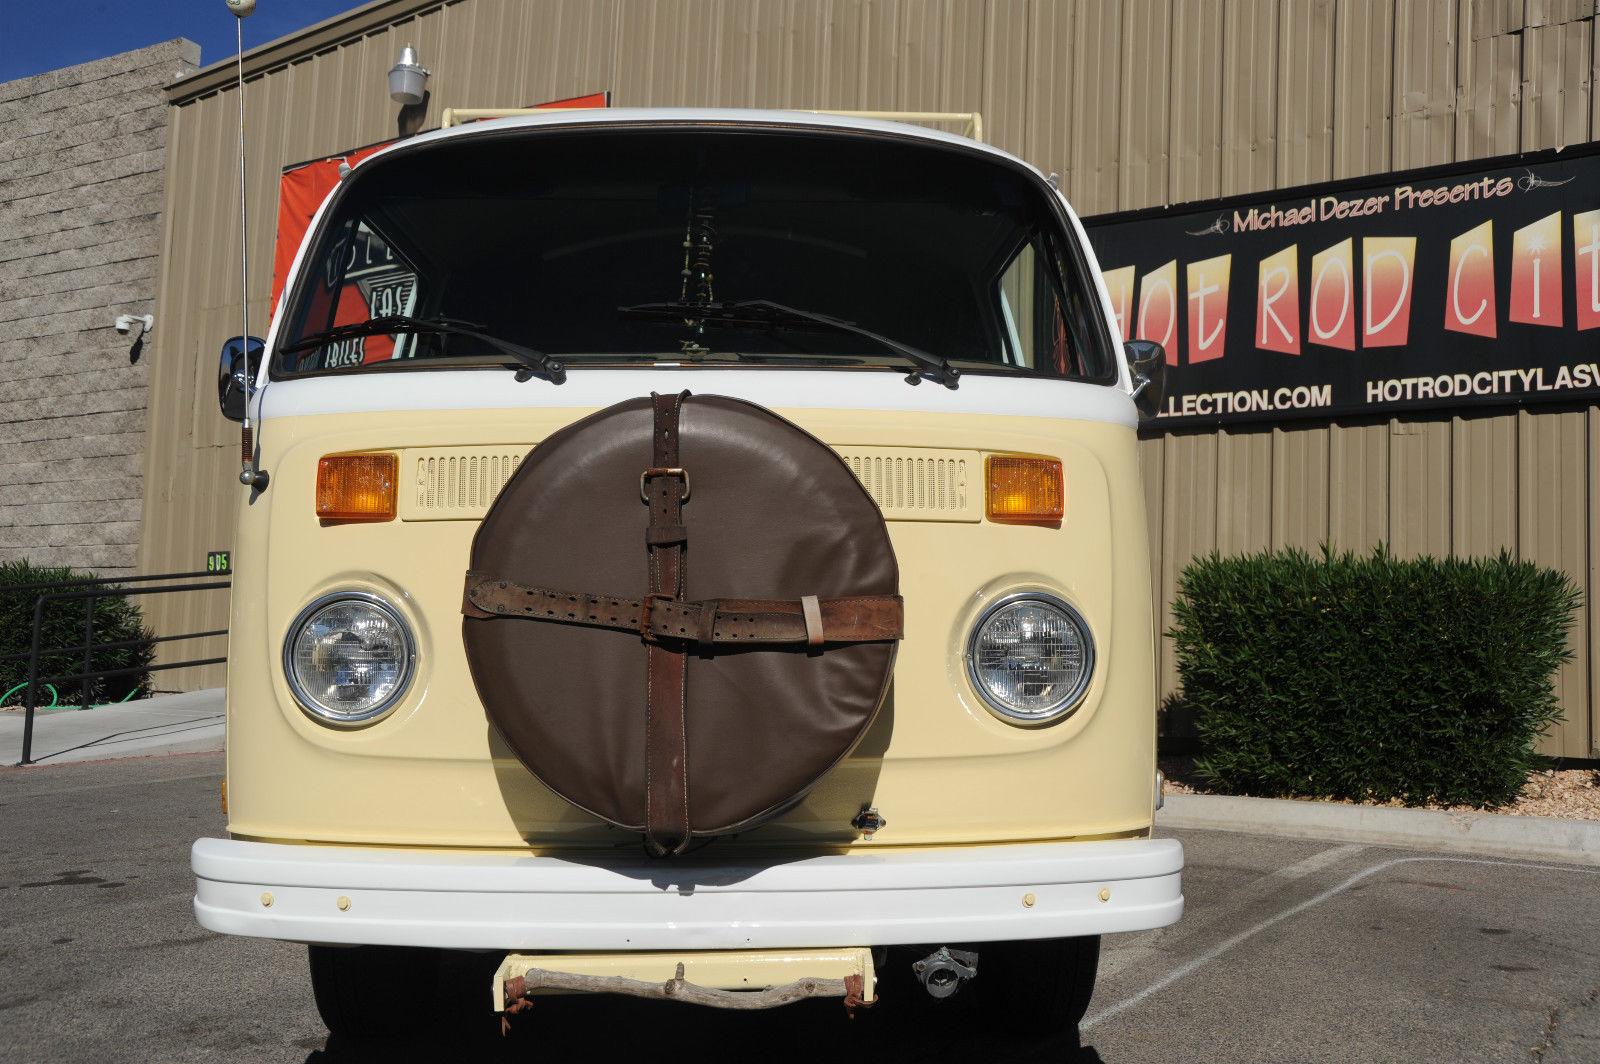 Wow 1974 Vw Kombi Hippie Bus New Paint Nice Interior Runs Great Roof Rack